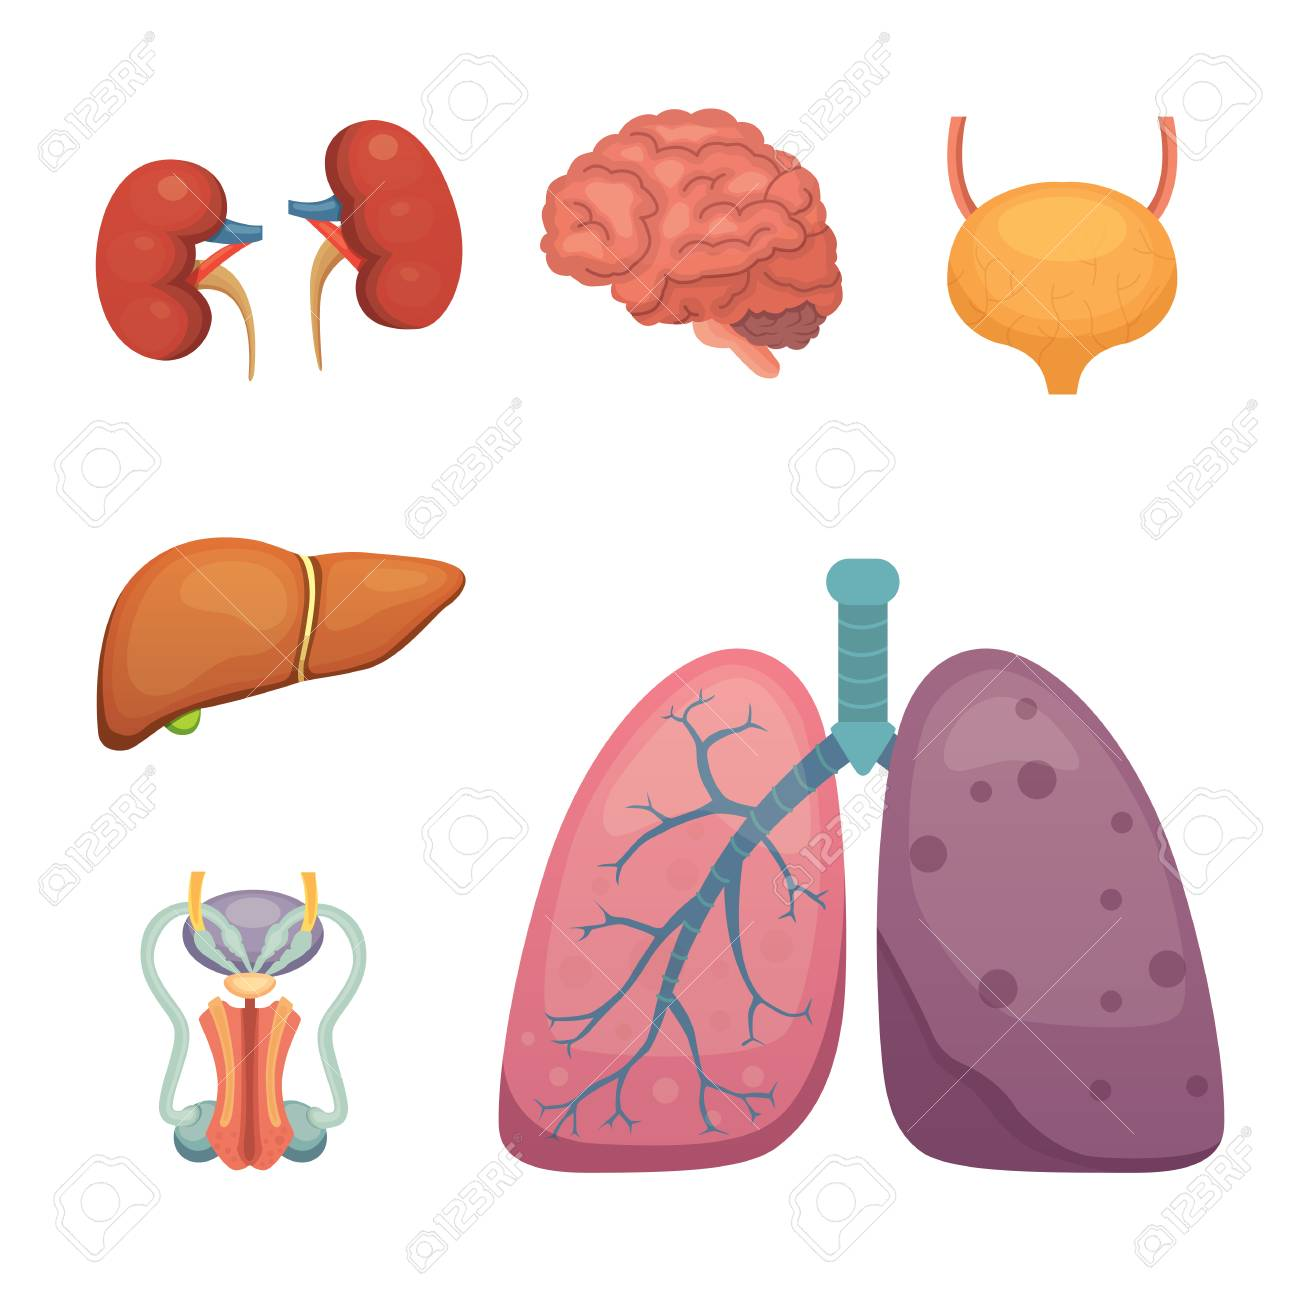 Cartoon Human Organs Set. Anatomy Of Body. Royalty Free Cliparts ...